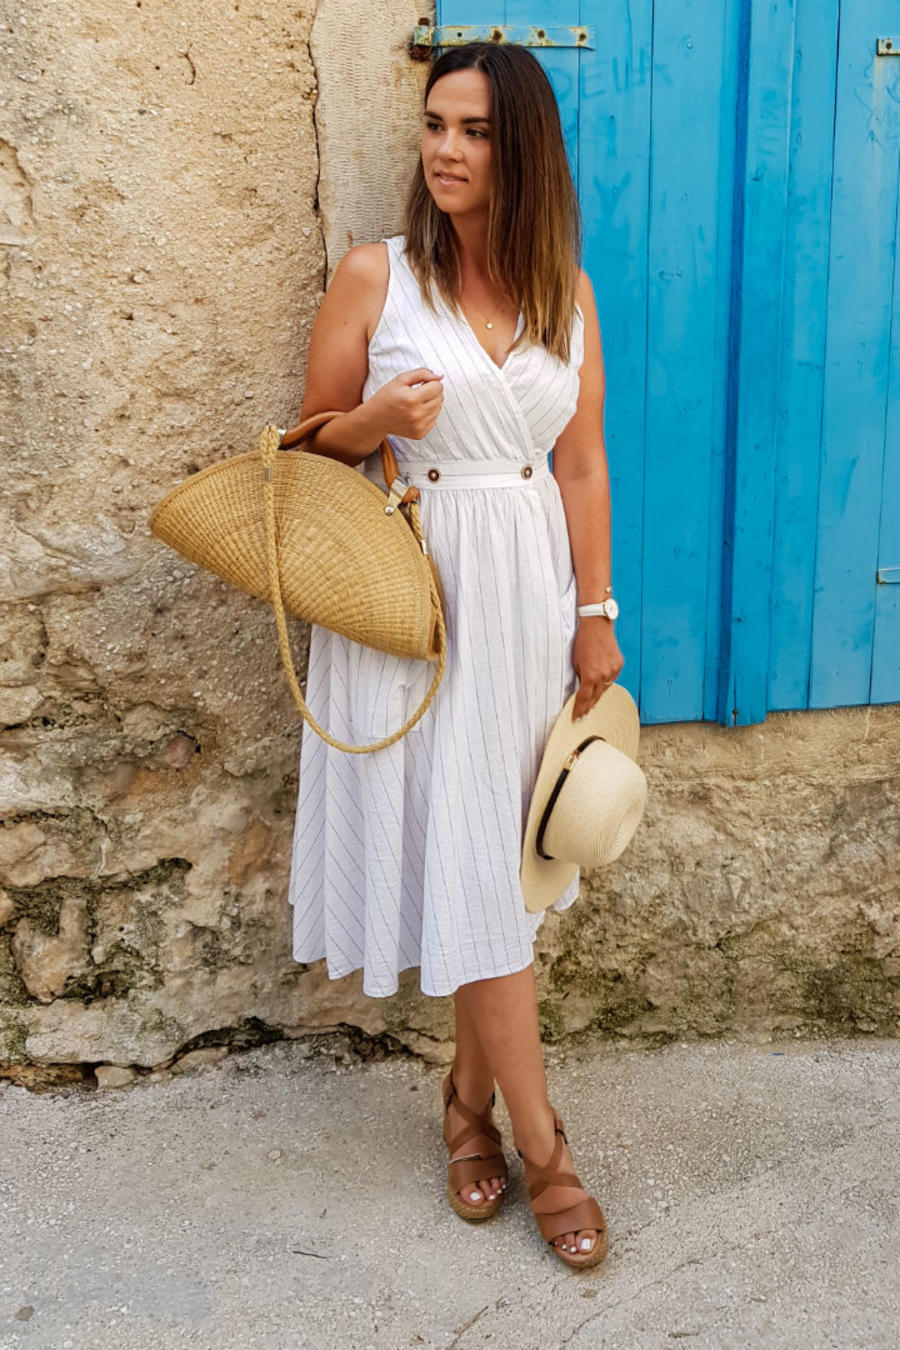 Mujeres usando vestido blanco